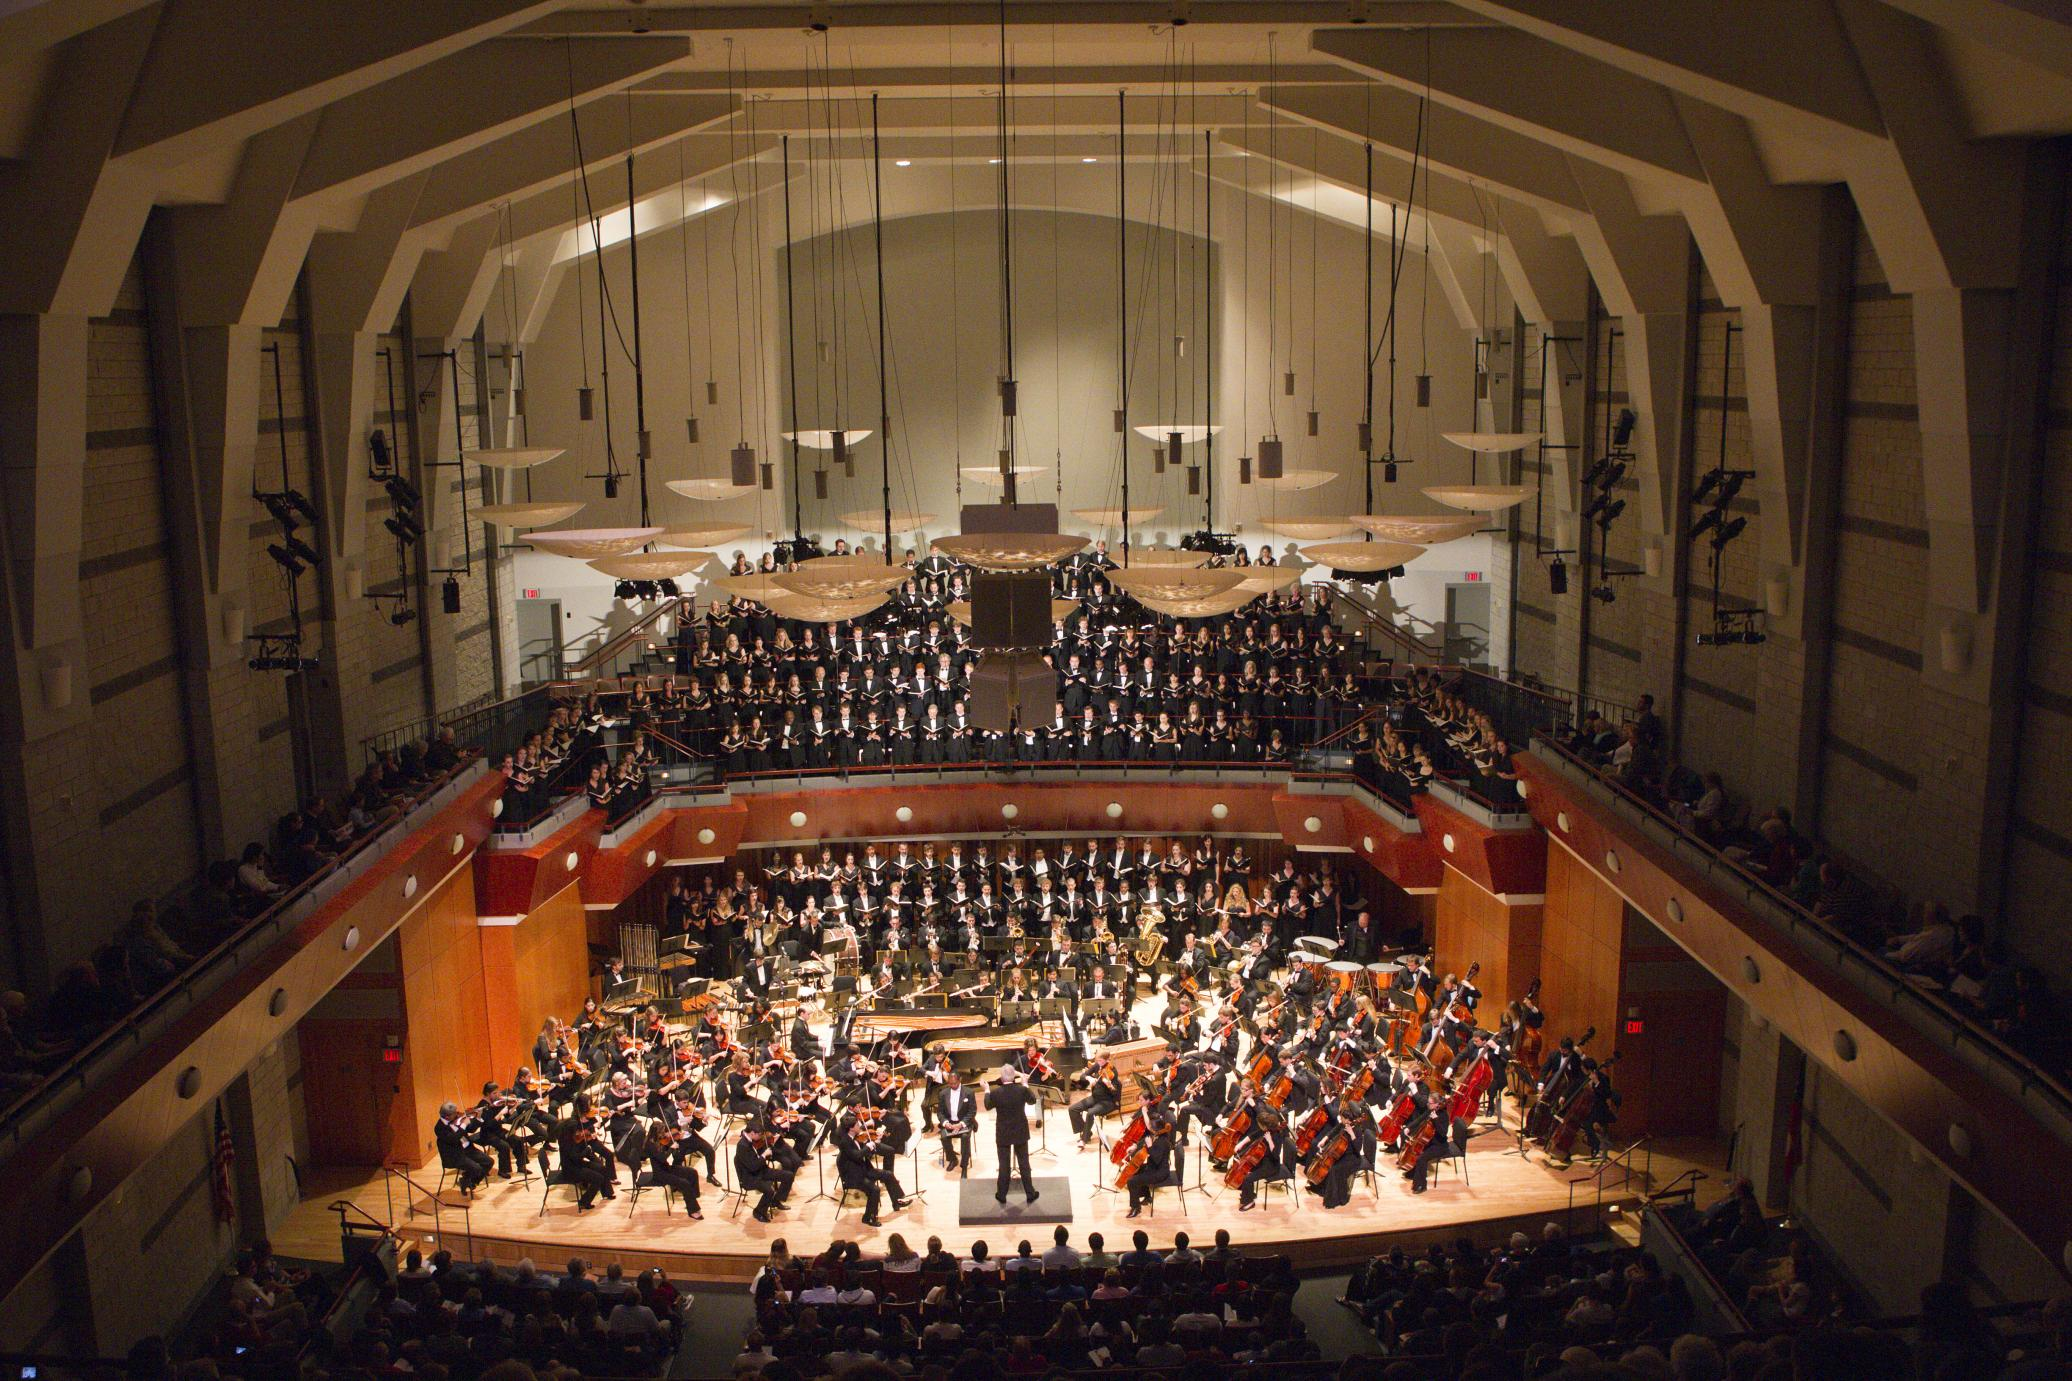 Symphony orchestra hugh hodgson school of music for Schoolhouse music